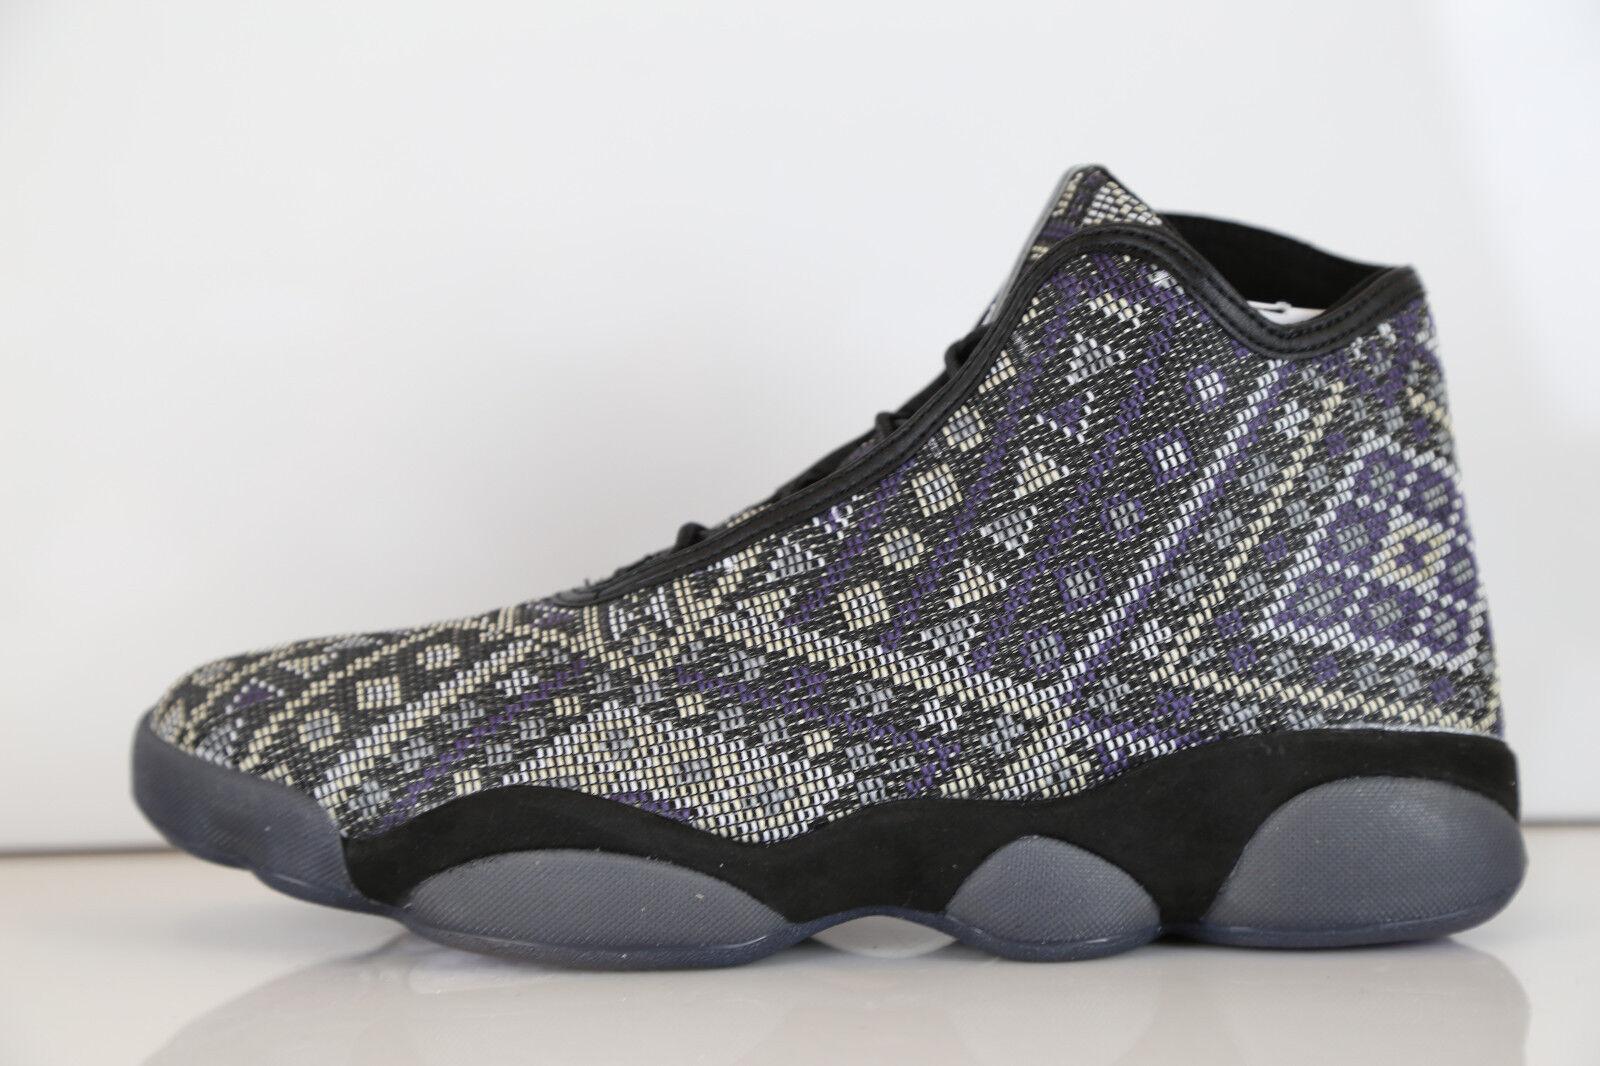 Nike Air Jordan Horizon Premium Black History Month BHM 822333-022 8-14 11 psny